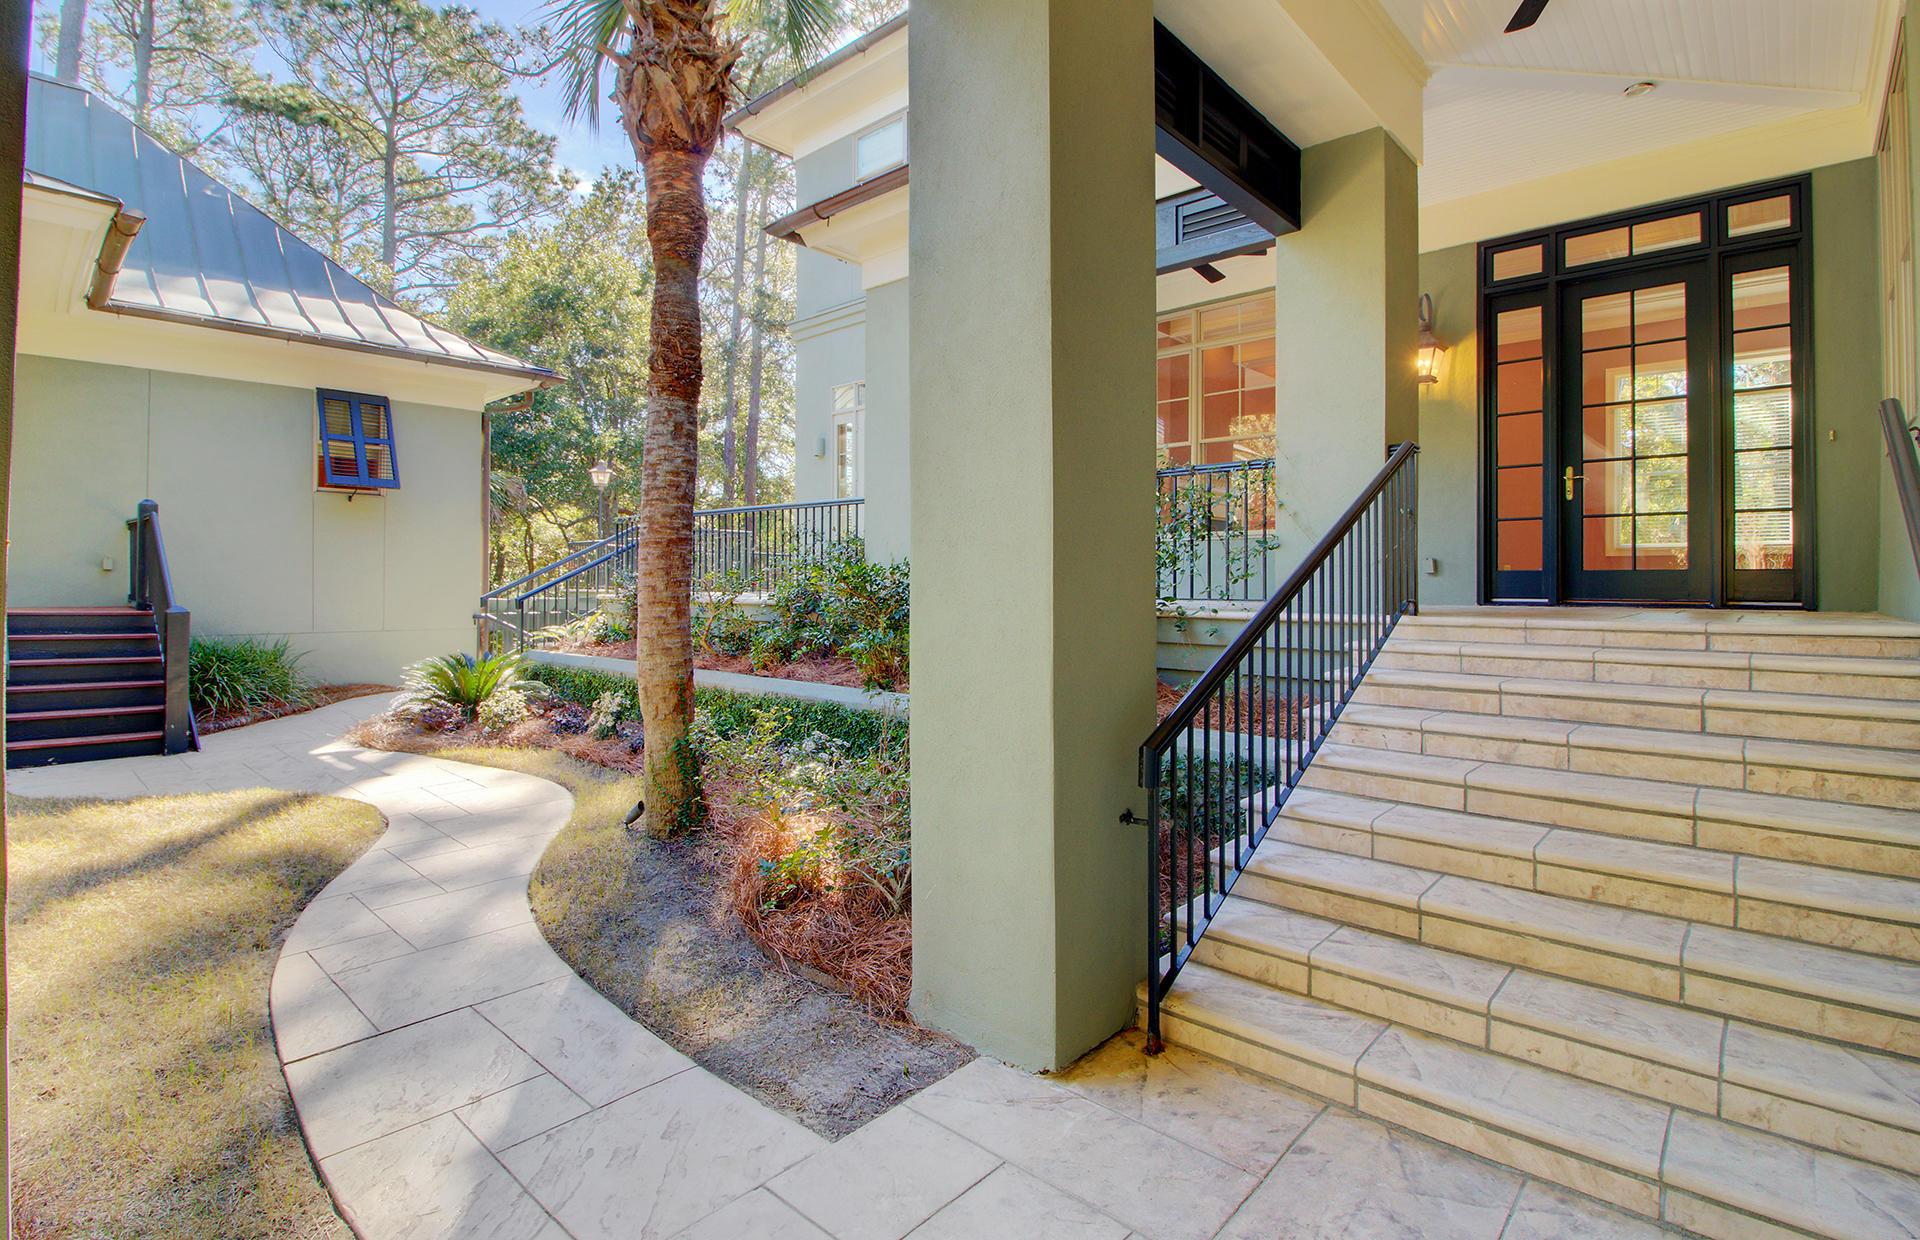 Kiawah Island Homes For Sale - 402 Ocean Oaks, Kiawah Island, SC - 14